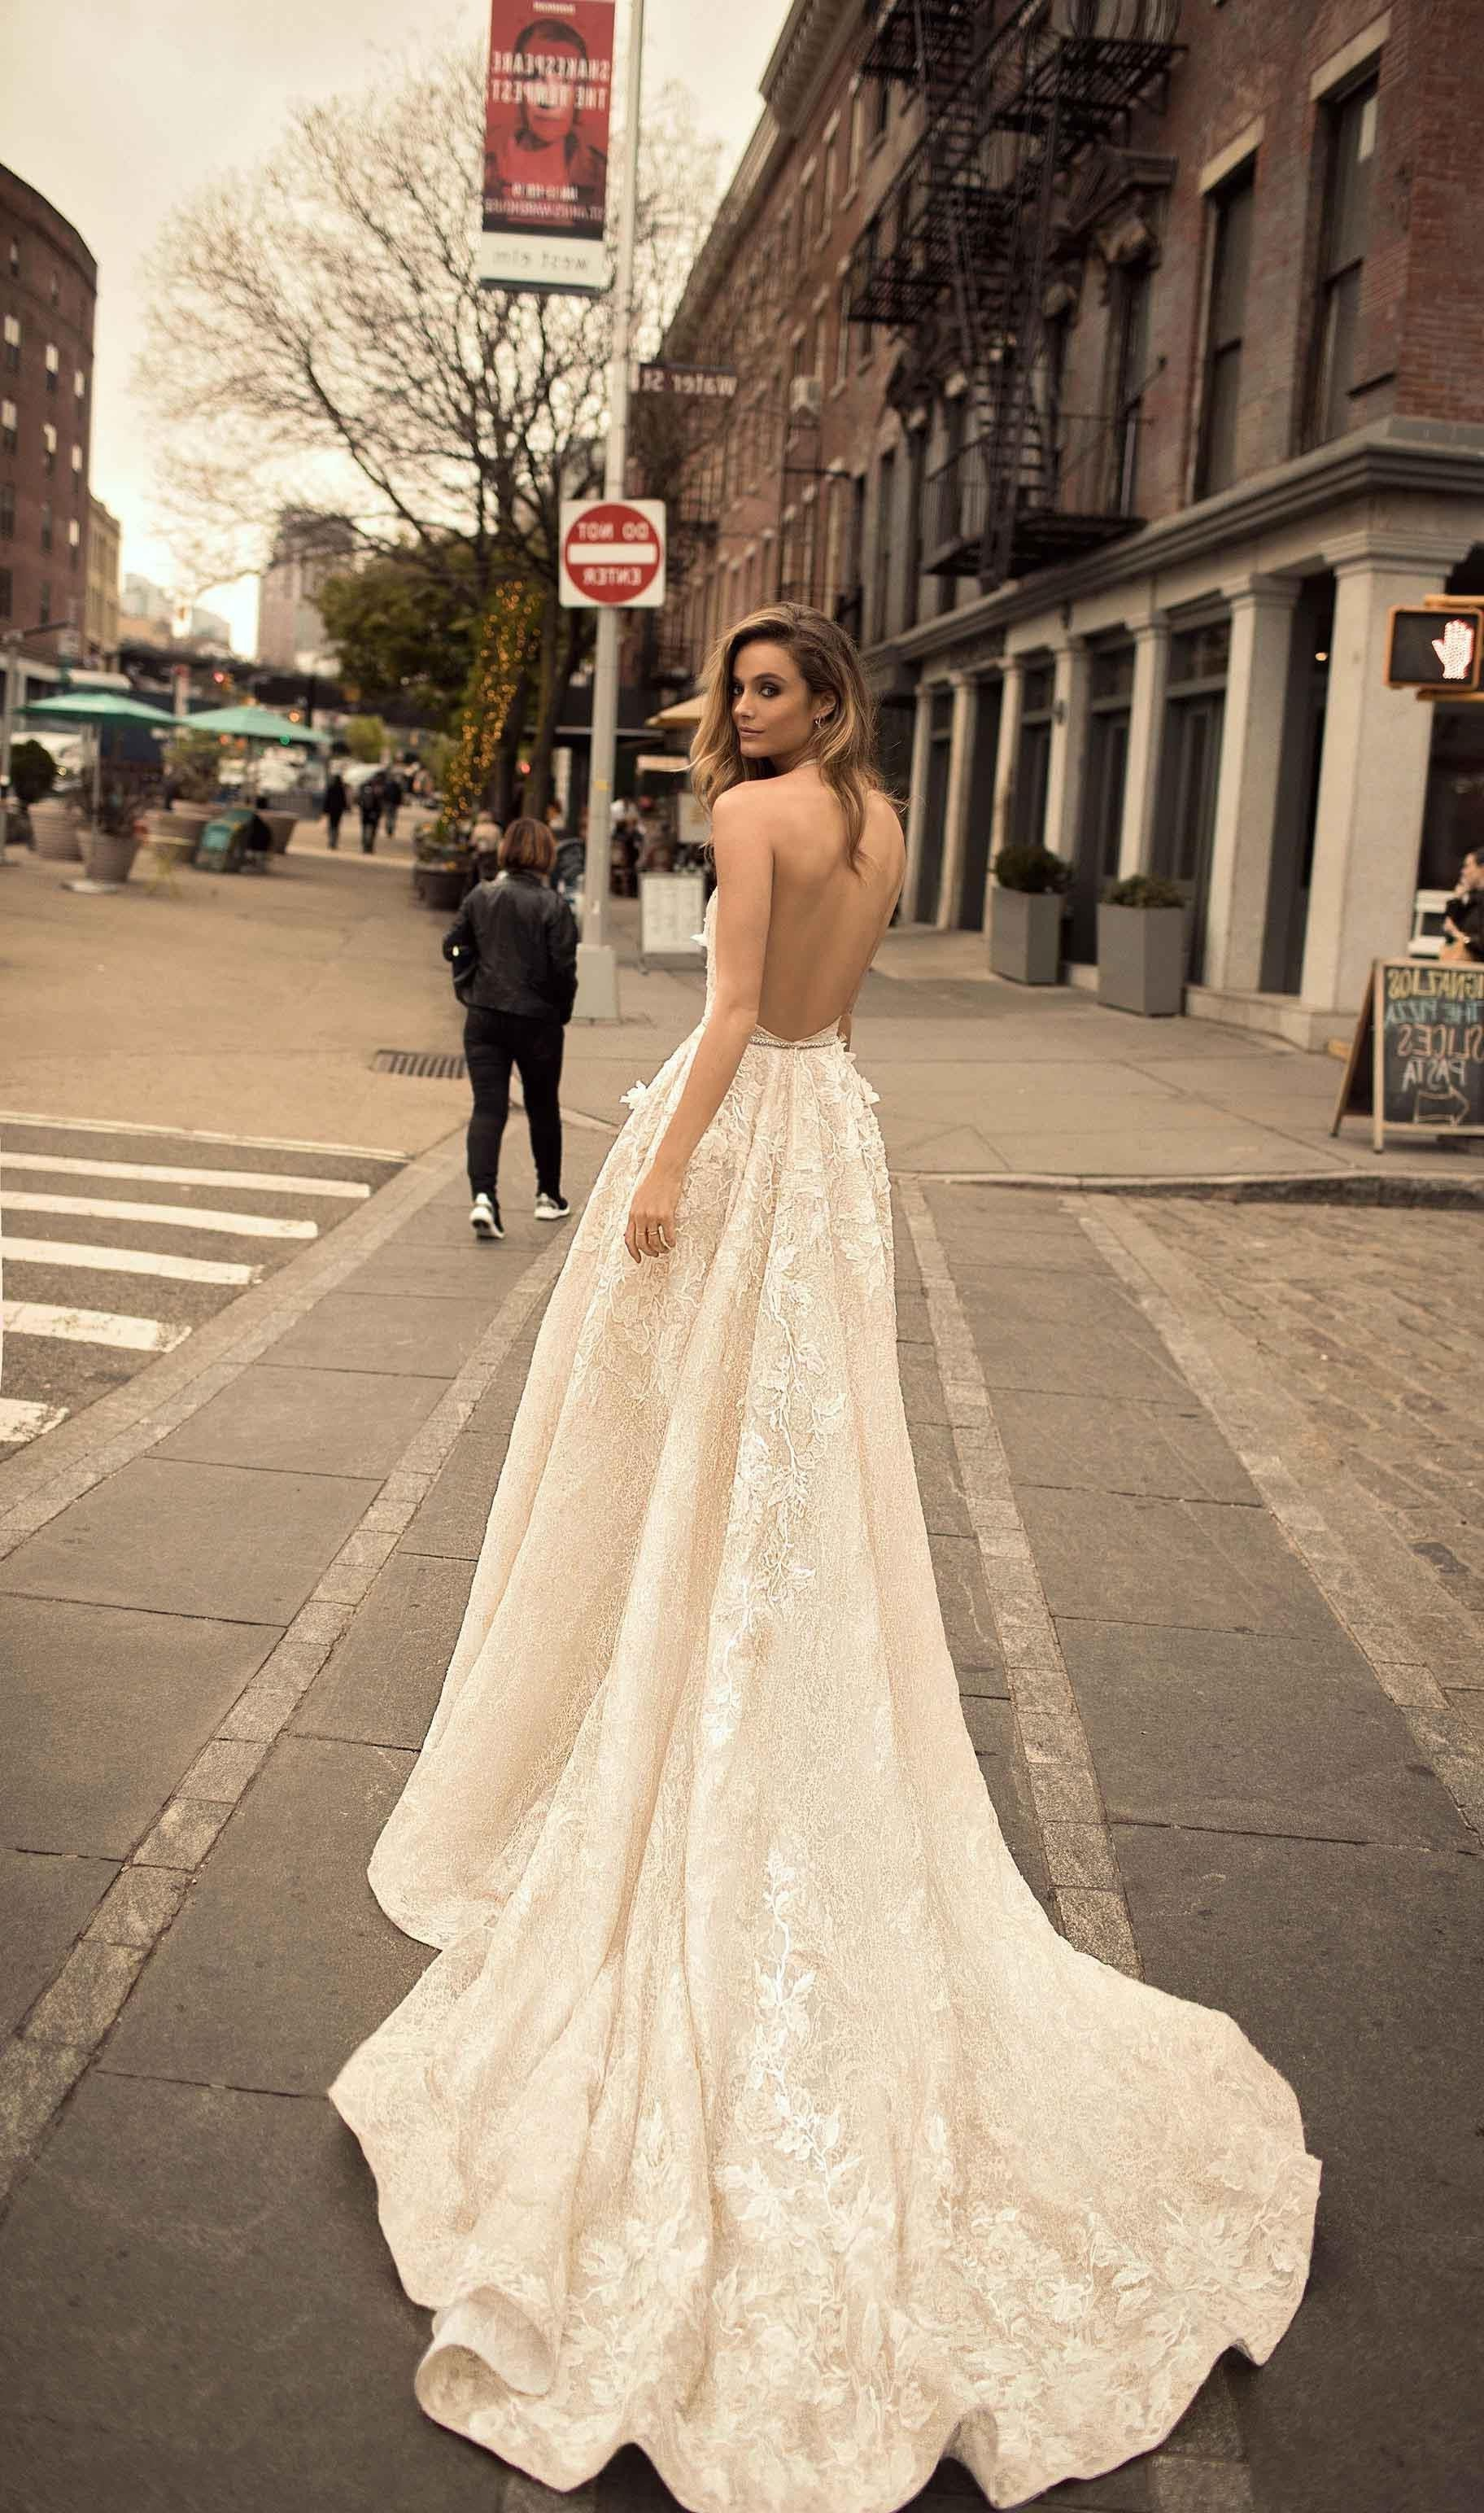 Design Dress Hijab Bridesmaid Nkde Wedding Ideas White and Gold Wedding Dress the Newest